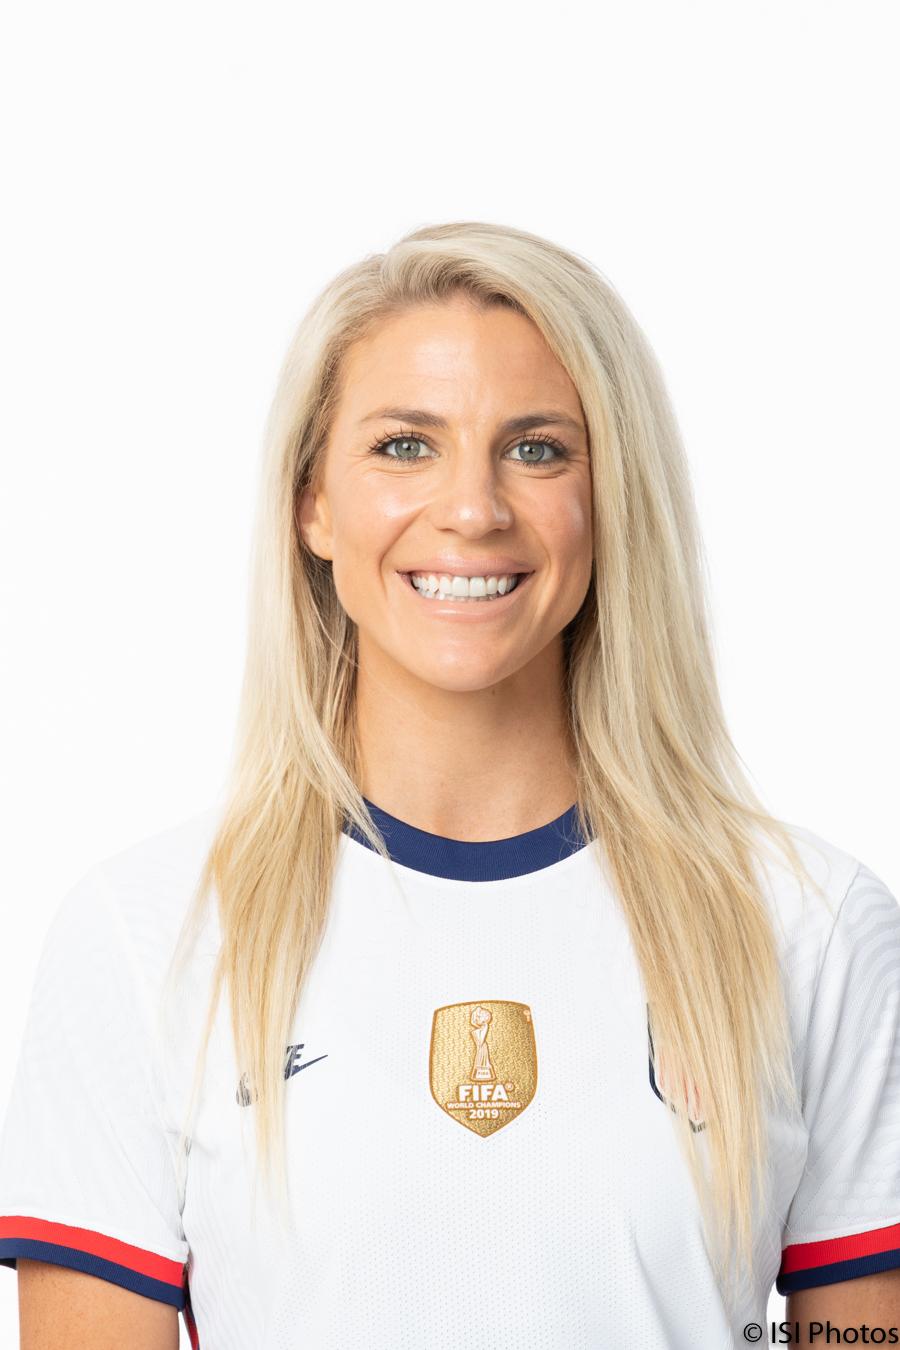 water4Her Athlete Ambassador, Julie Ertz - U.S. Women's National Soccer Team player and 2019 U.S. Soccer Female Player of the Year.